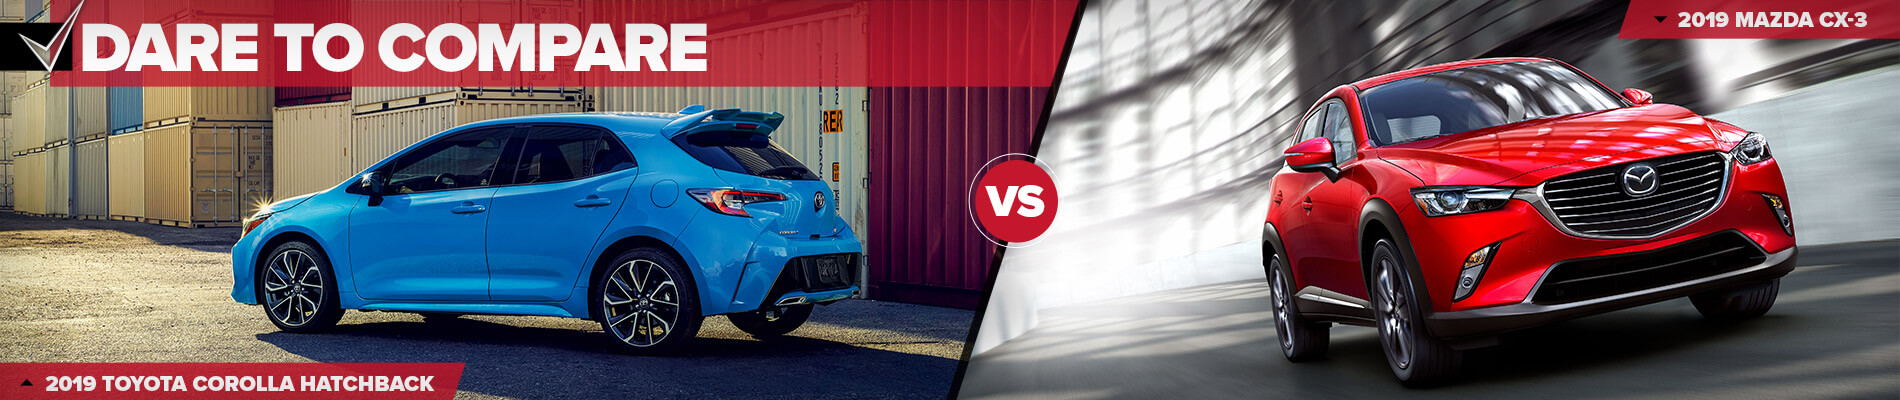 2019 toyota corolla hatchback vs. 2019 mazda cx-3